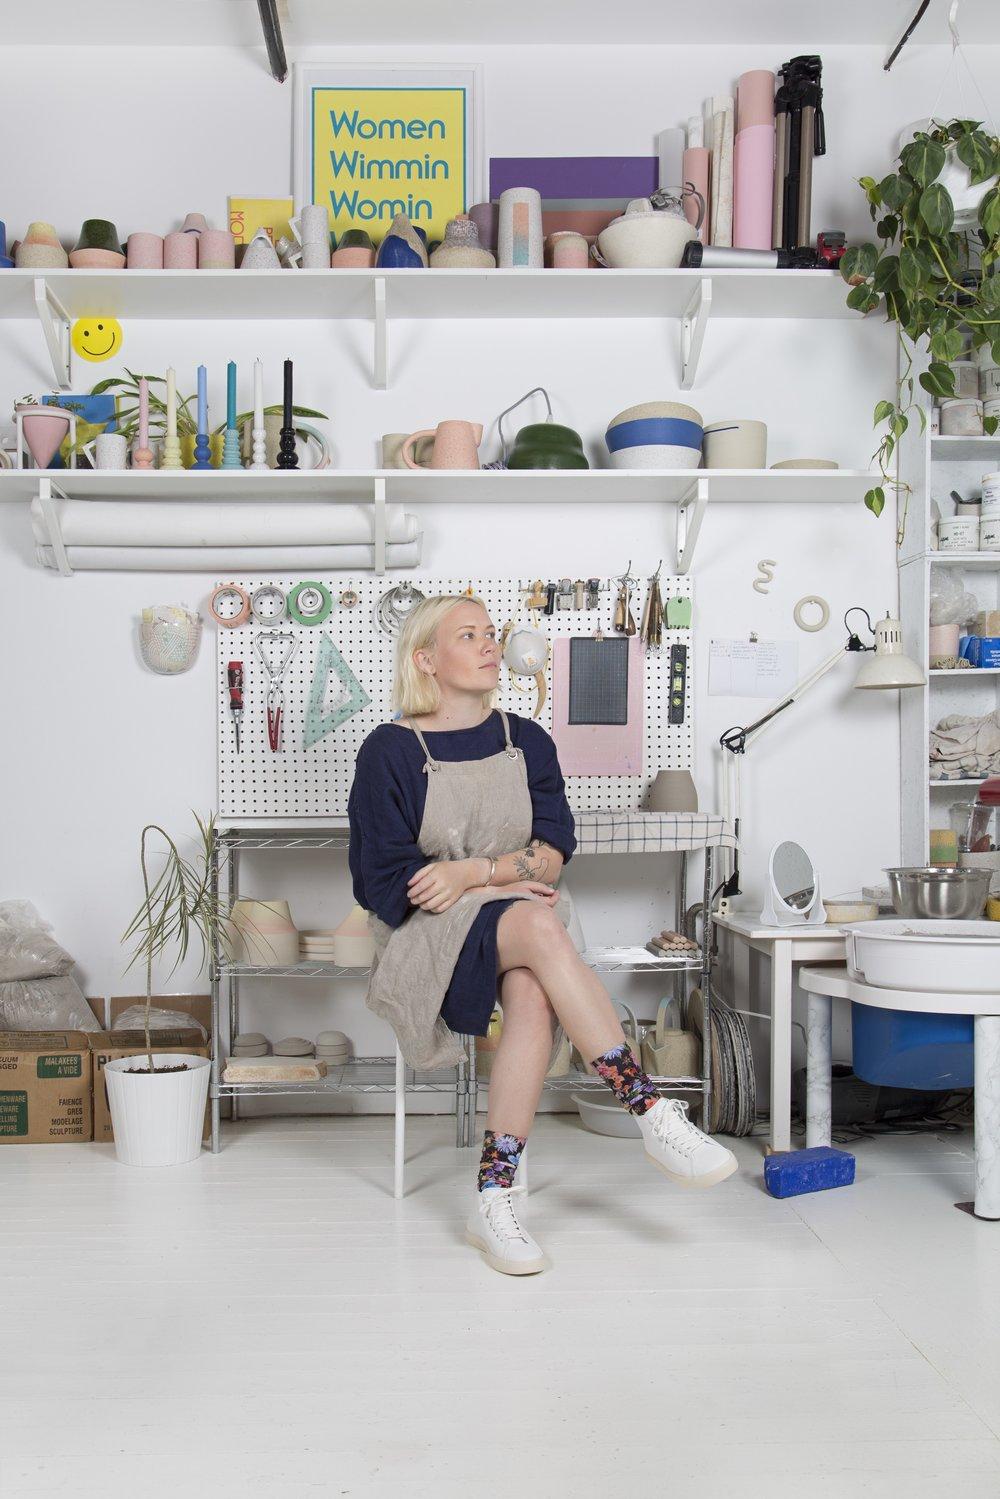 woman sitting on stool pondering